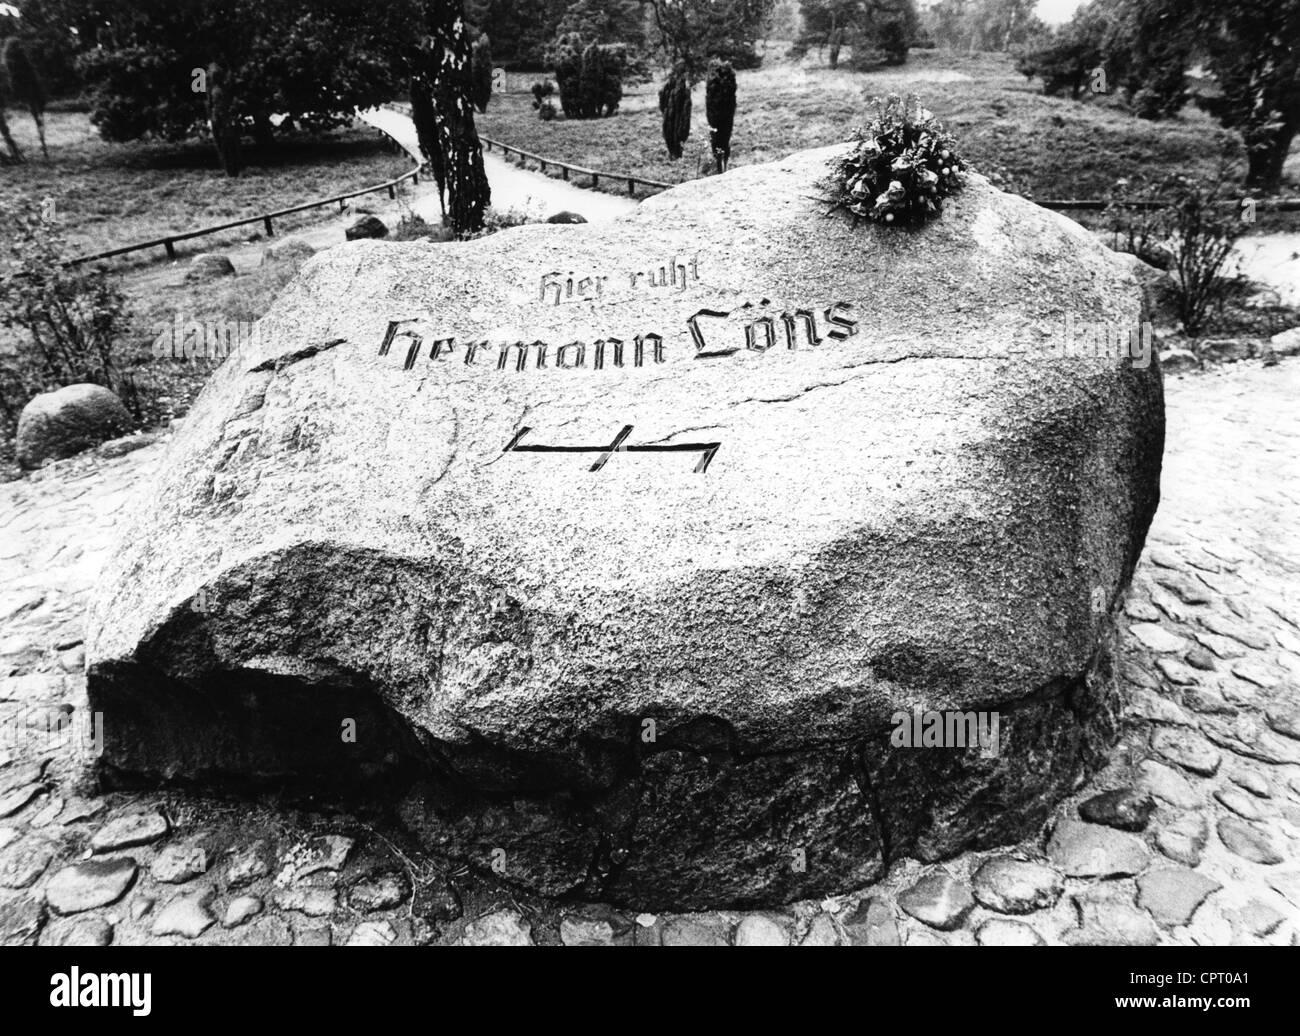 Loens, Herman, 29.8.1866 - 26.9.1914 (killed in World War One), German author / writer (poet), gravestone near Fallingbostel, - Stock Image